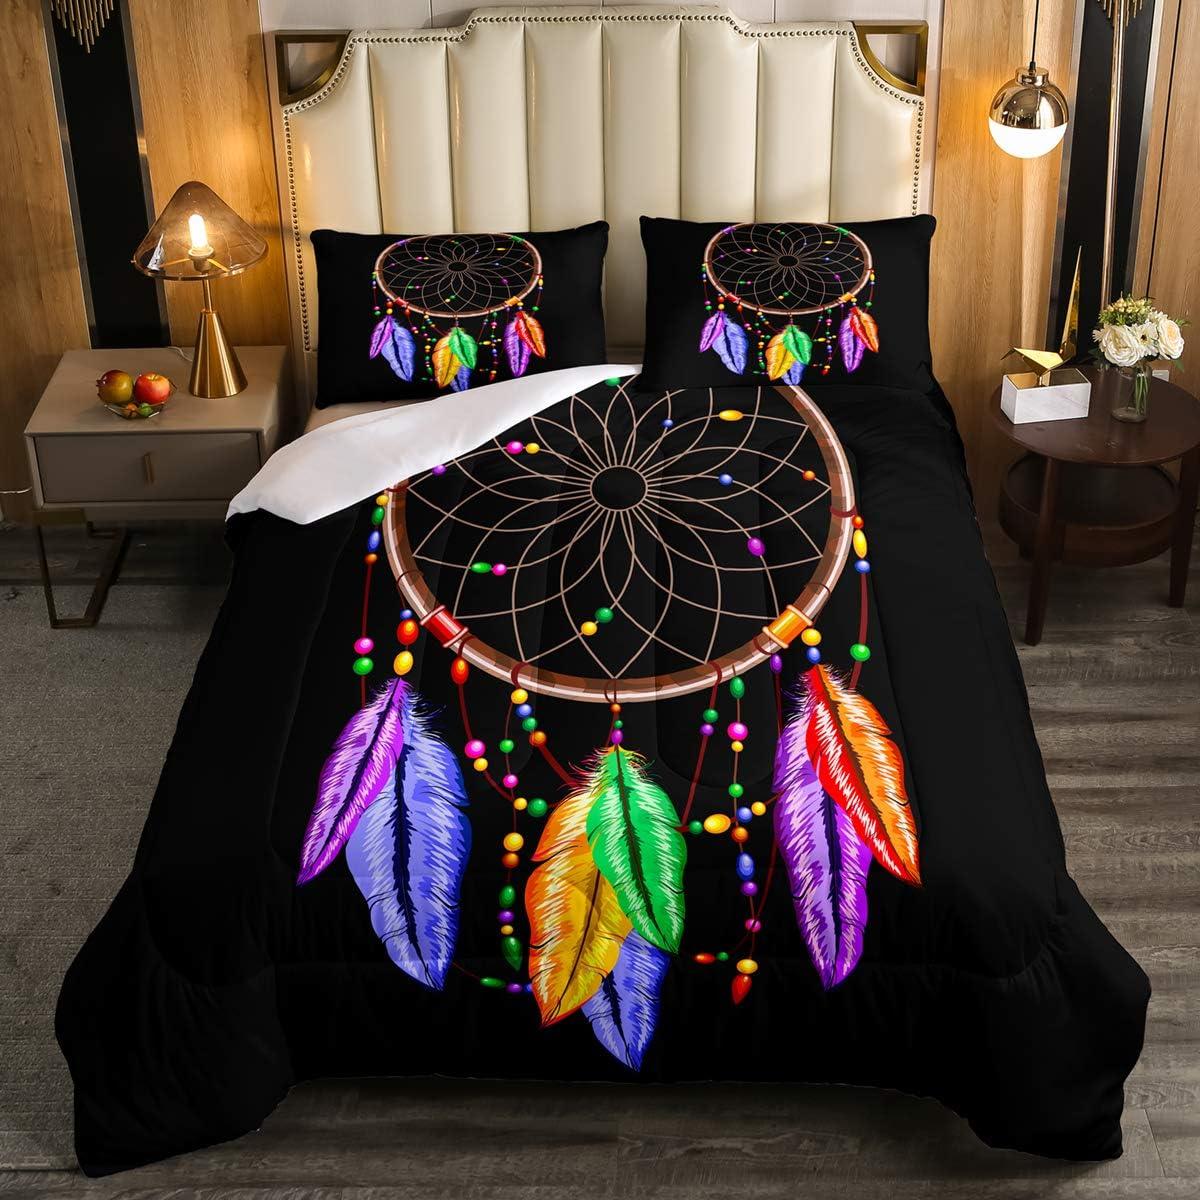 Erosebridal Dream Catcher Feather Quilted Coverlet King Size Bohemian Mandala Coverlet Set Tie-Dye Spiral Bedspread for Kids Boys Girls Teens Boho Chic Floral Quilt Bedroom Decor